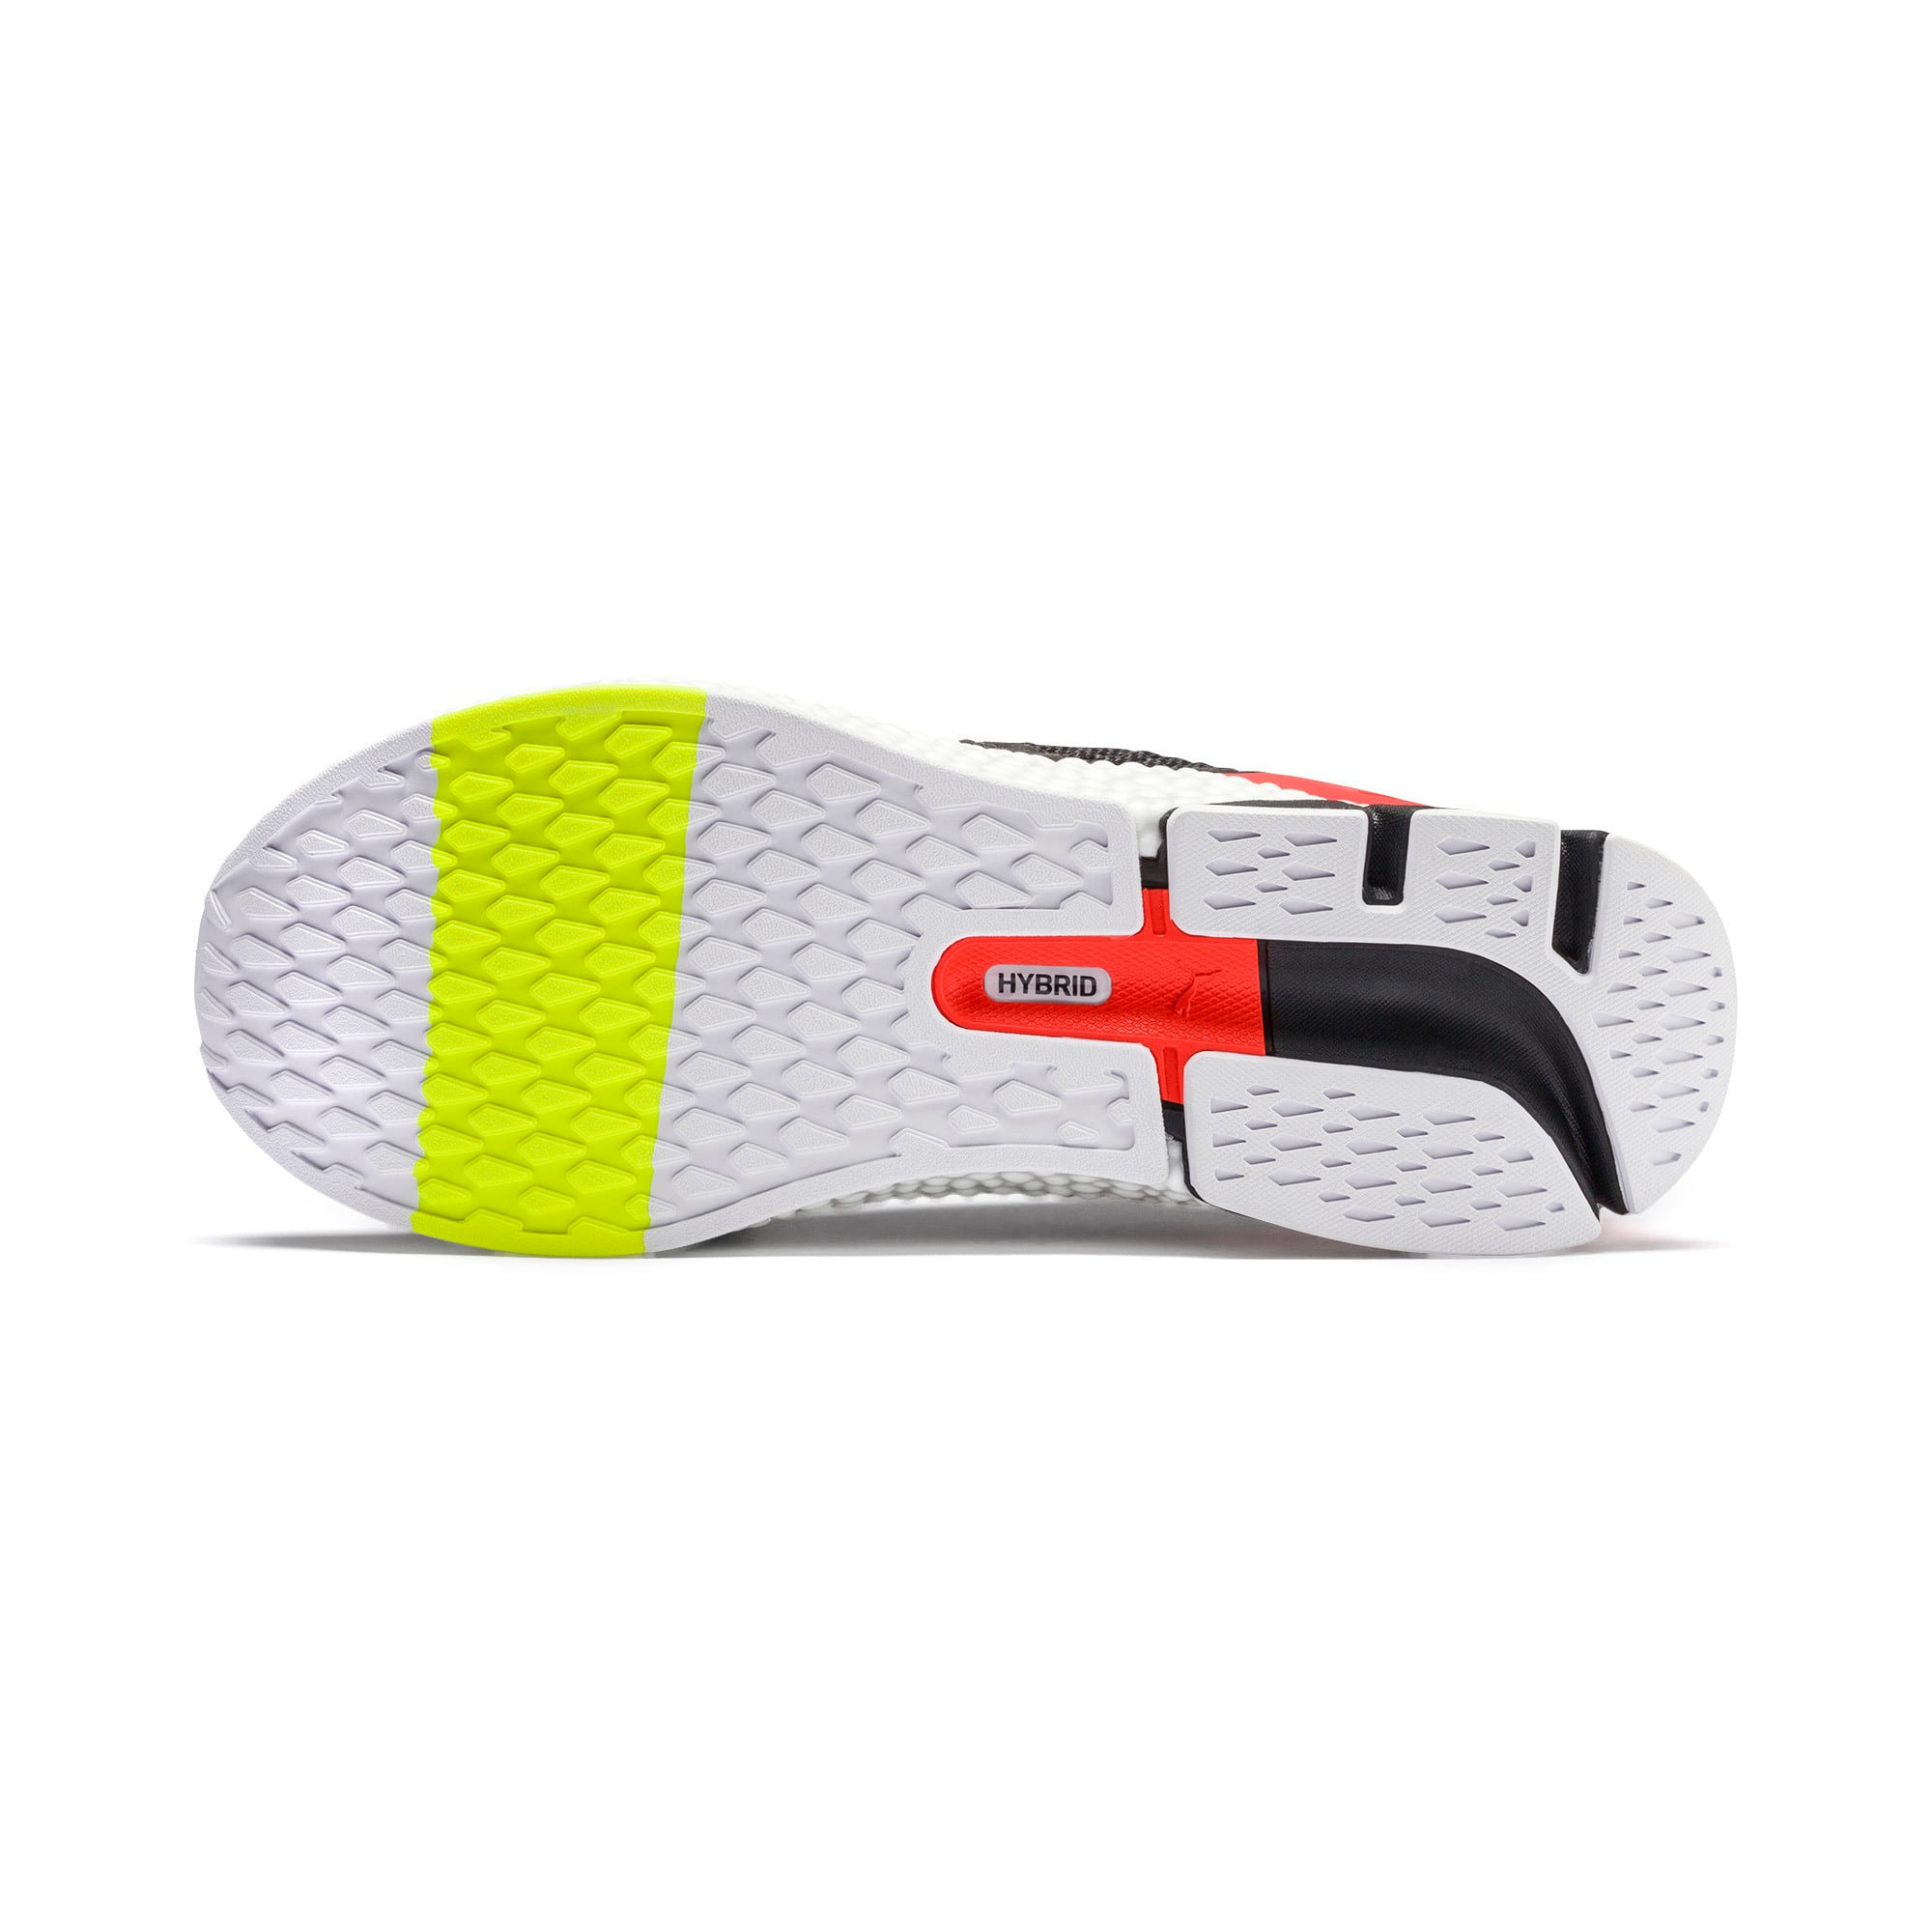 Thumbnail 5 of HYBRID NETFIT Astro Men's Running Shoes, CASTLEROCK-Puma Blck-Ngy Red, medium